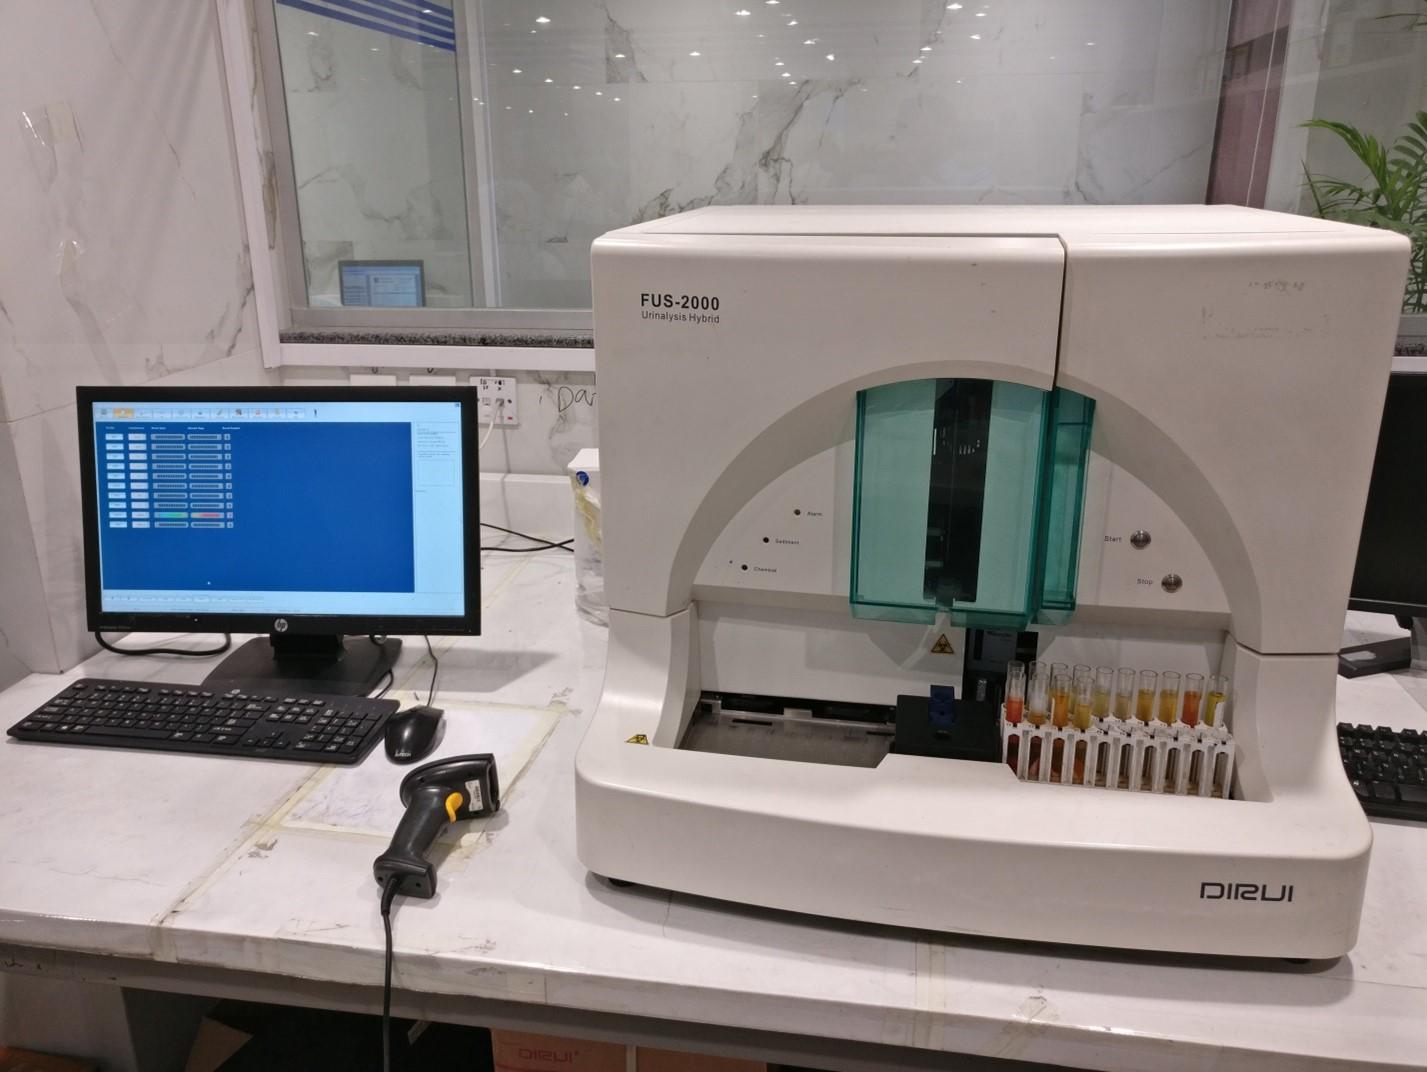 DIRUI FUS-2000 automated urine analyzer